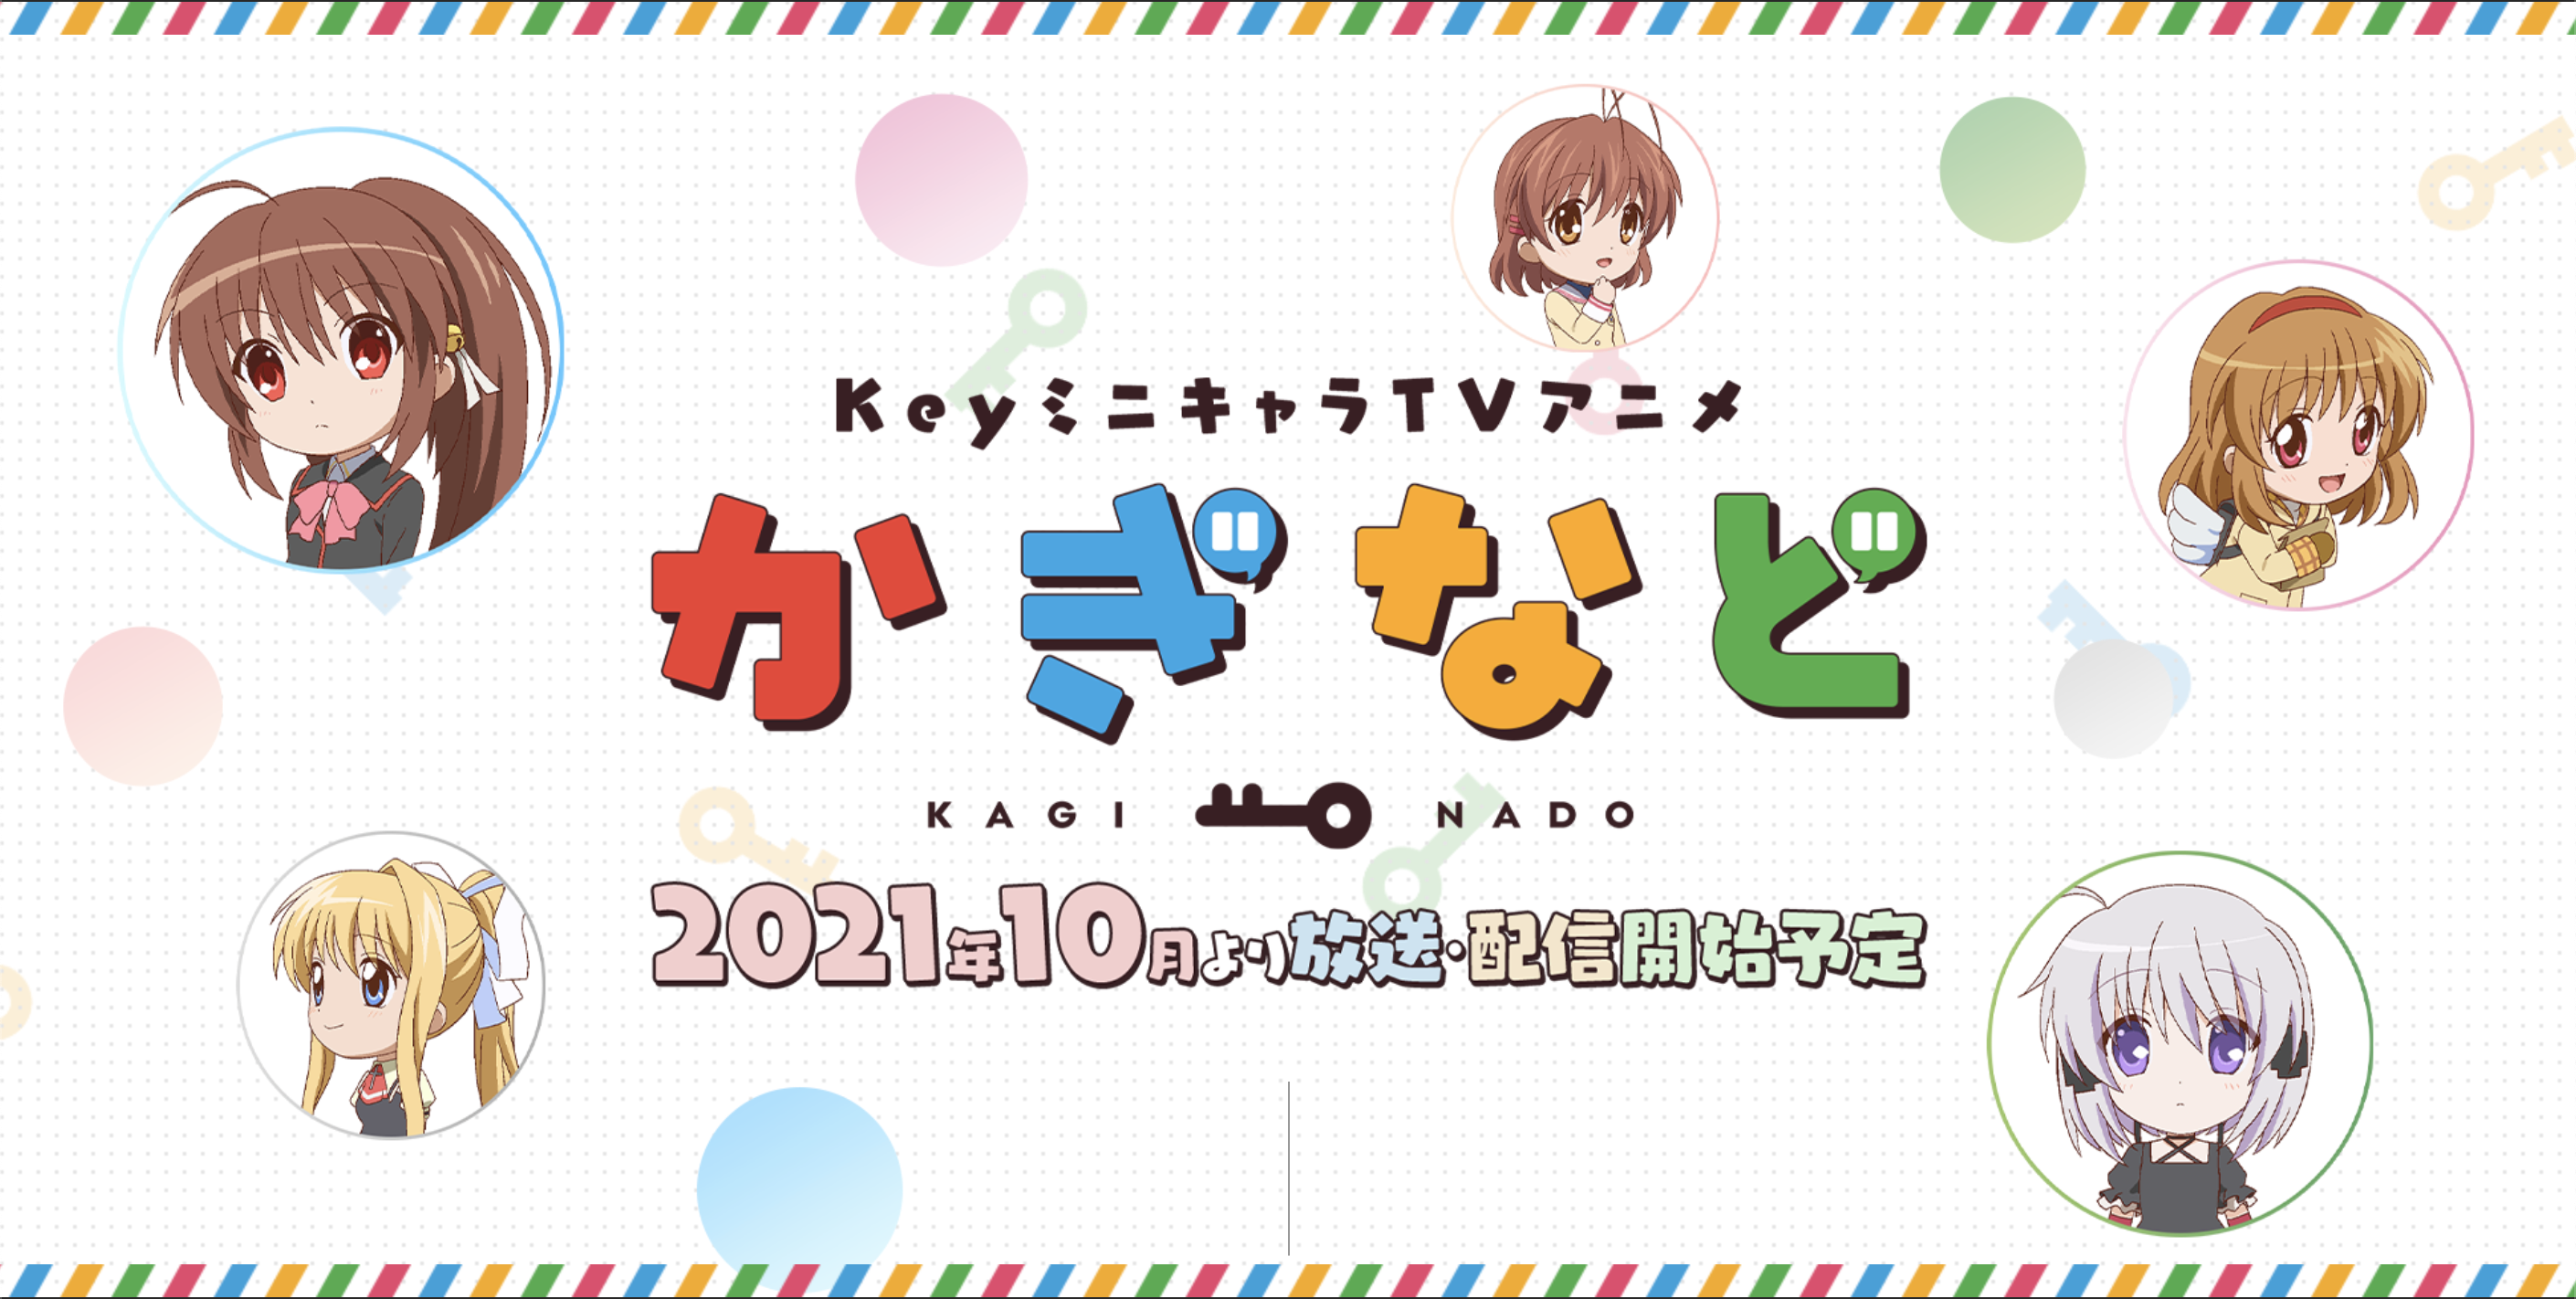 Kaginado key visual